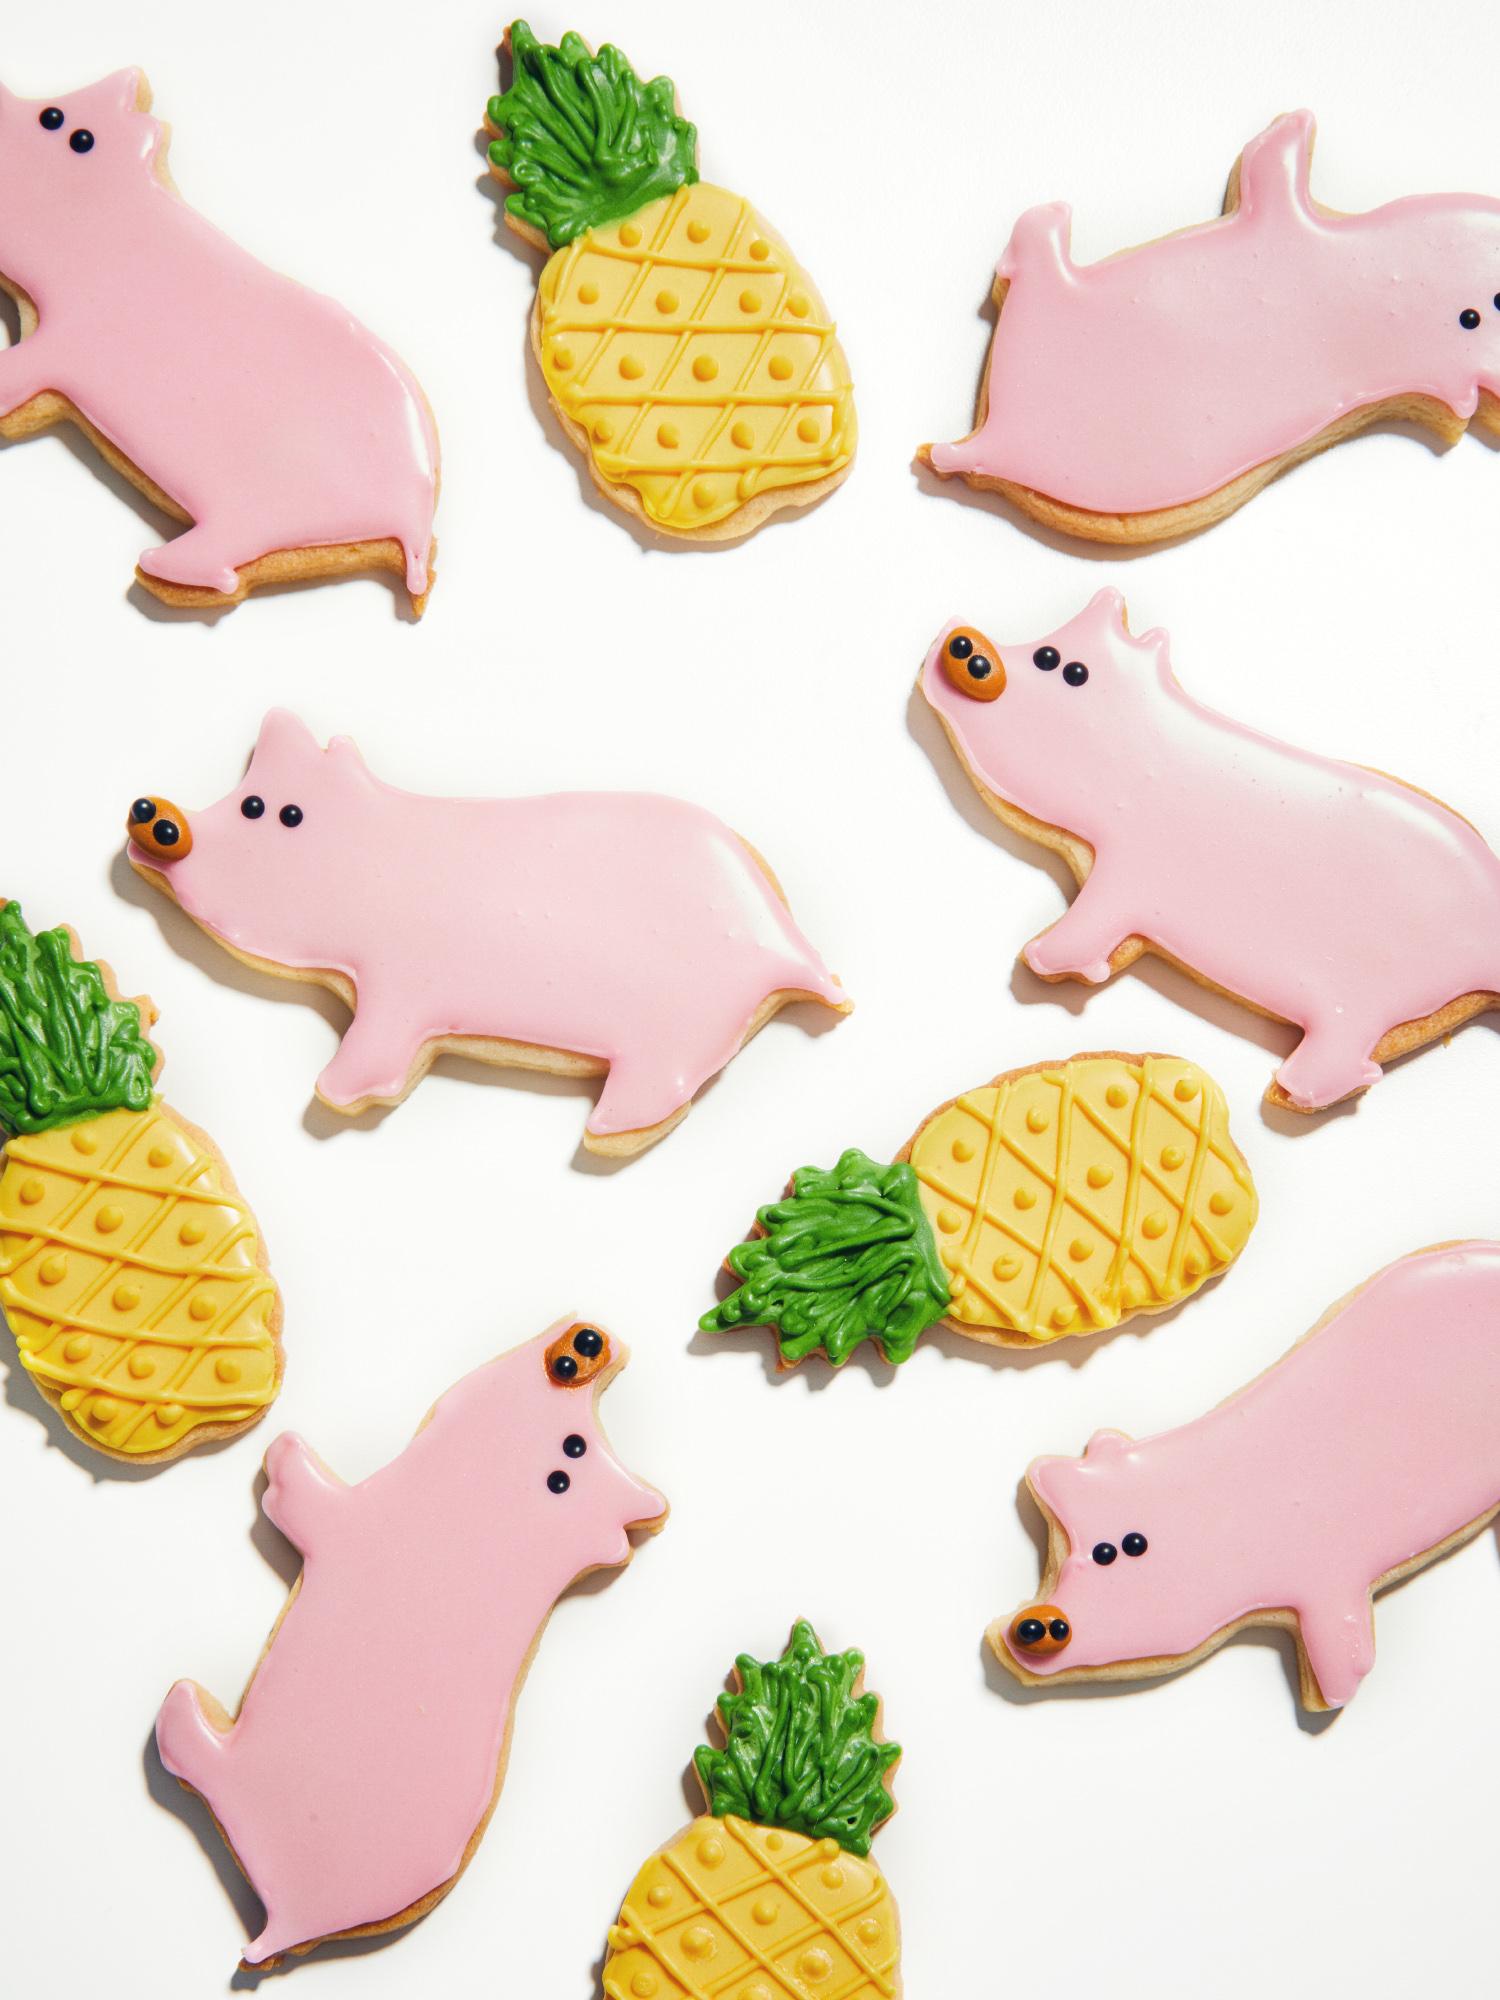 Pork and Pineapple